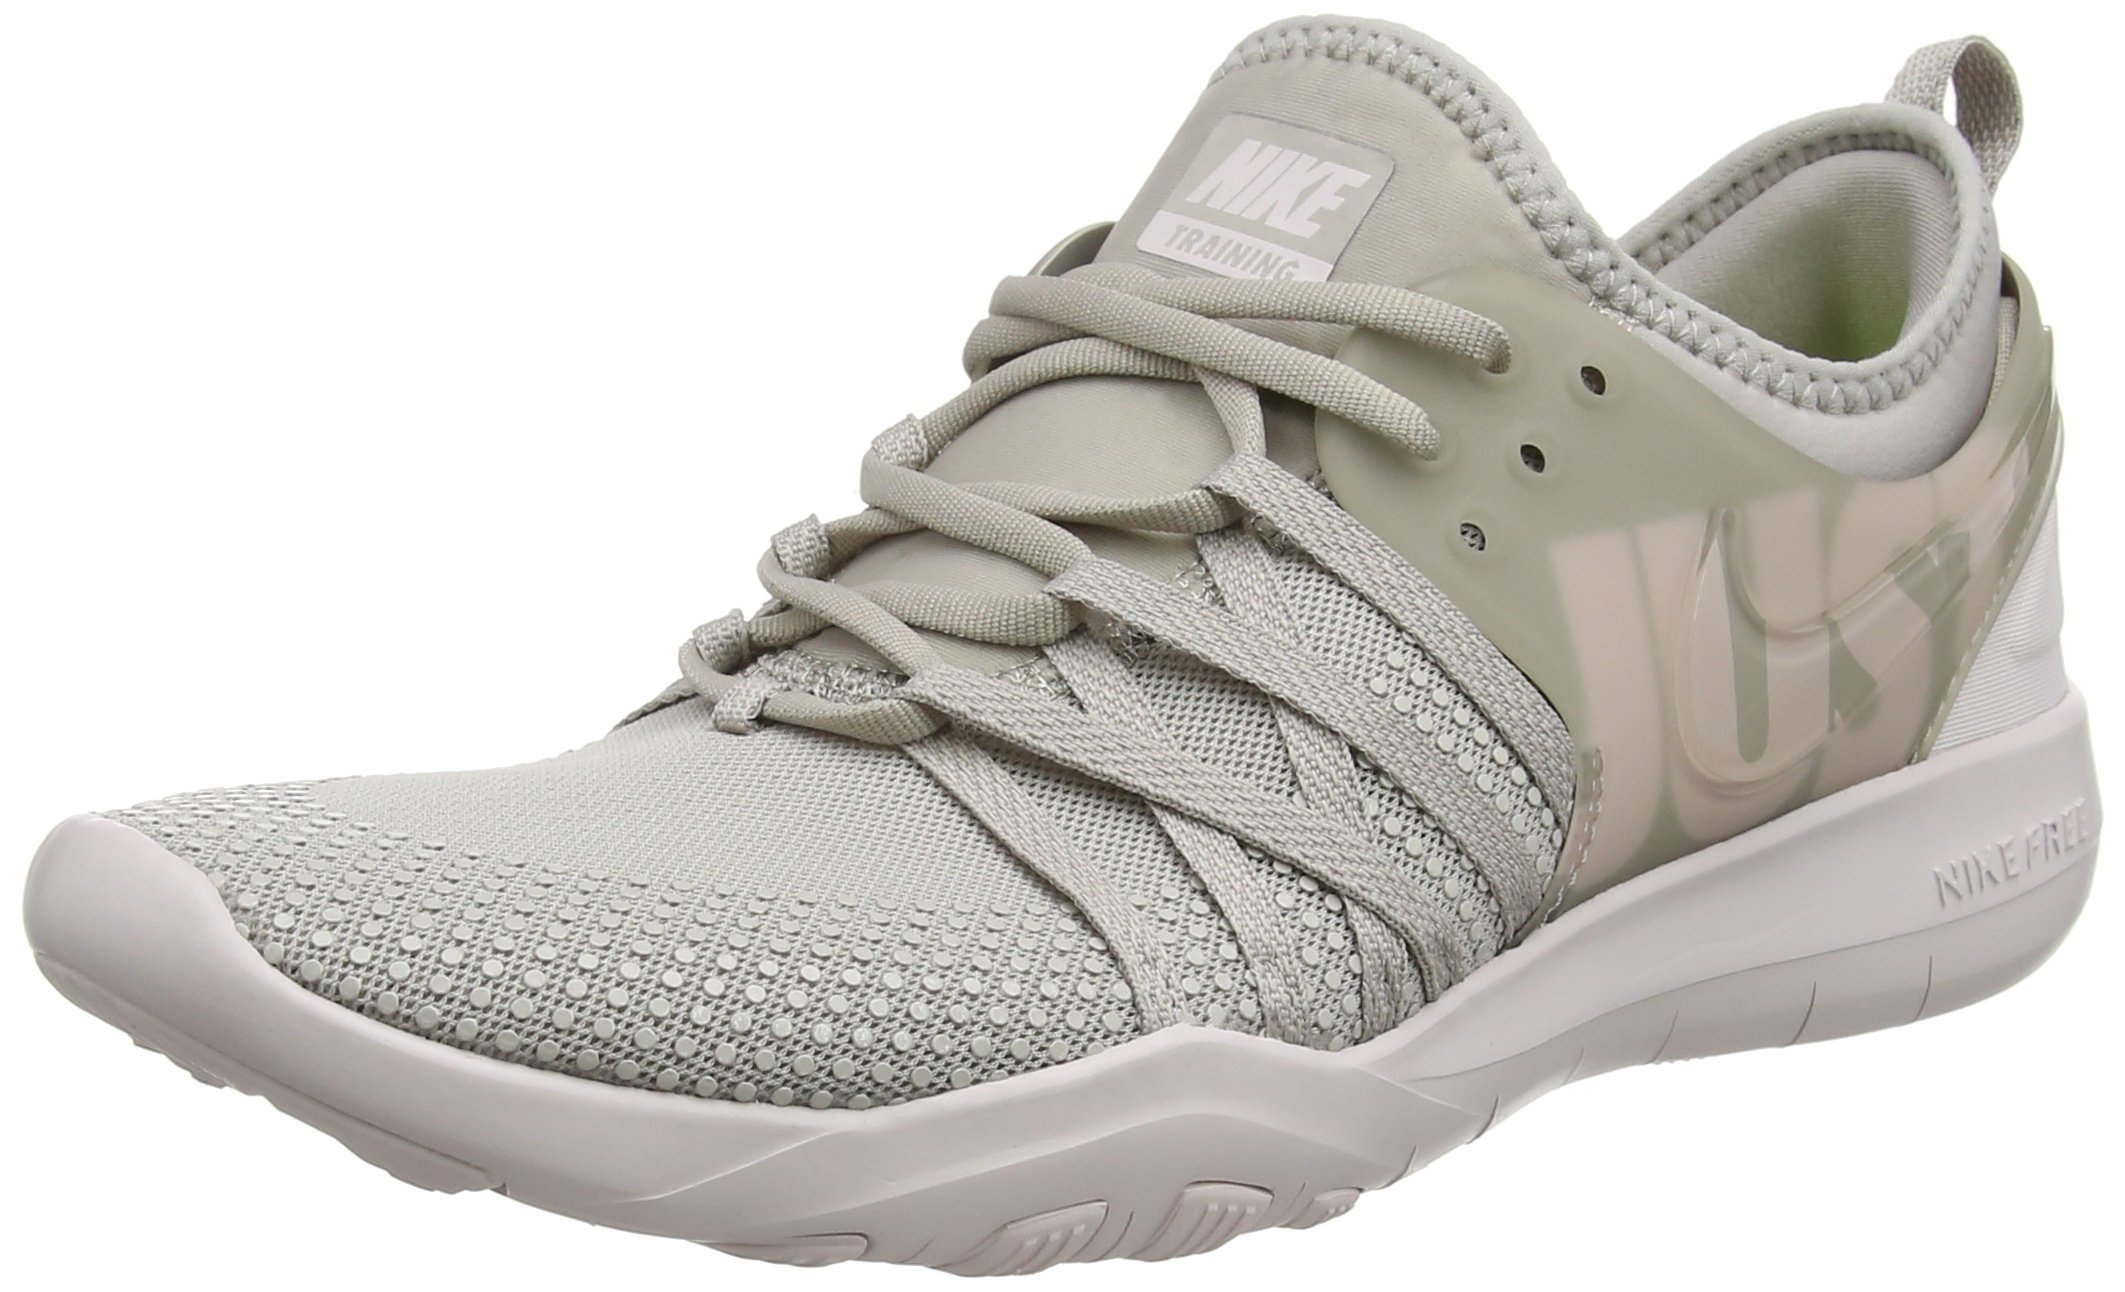 21d85f8c35376 Galleon - Nike Women s WMNS Free Tr 7 Premium Trainers